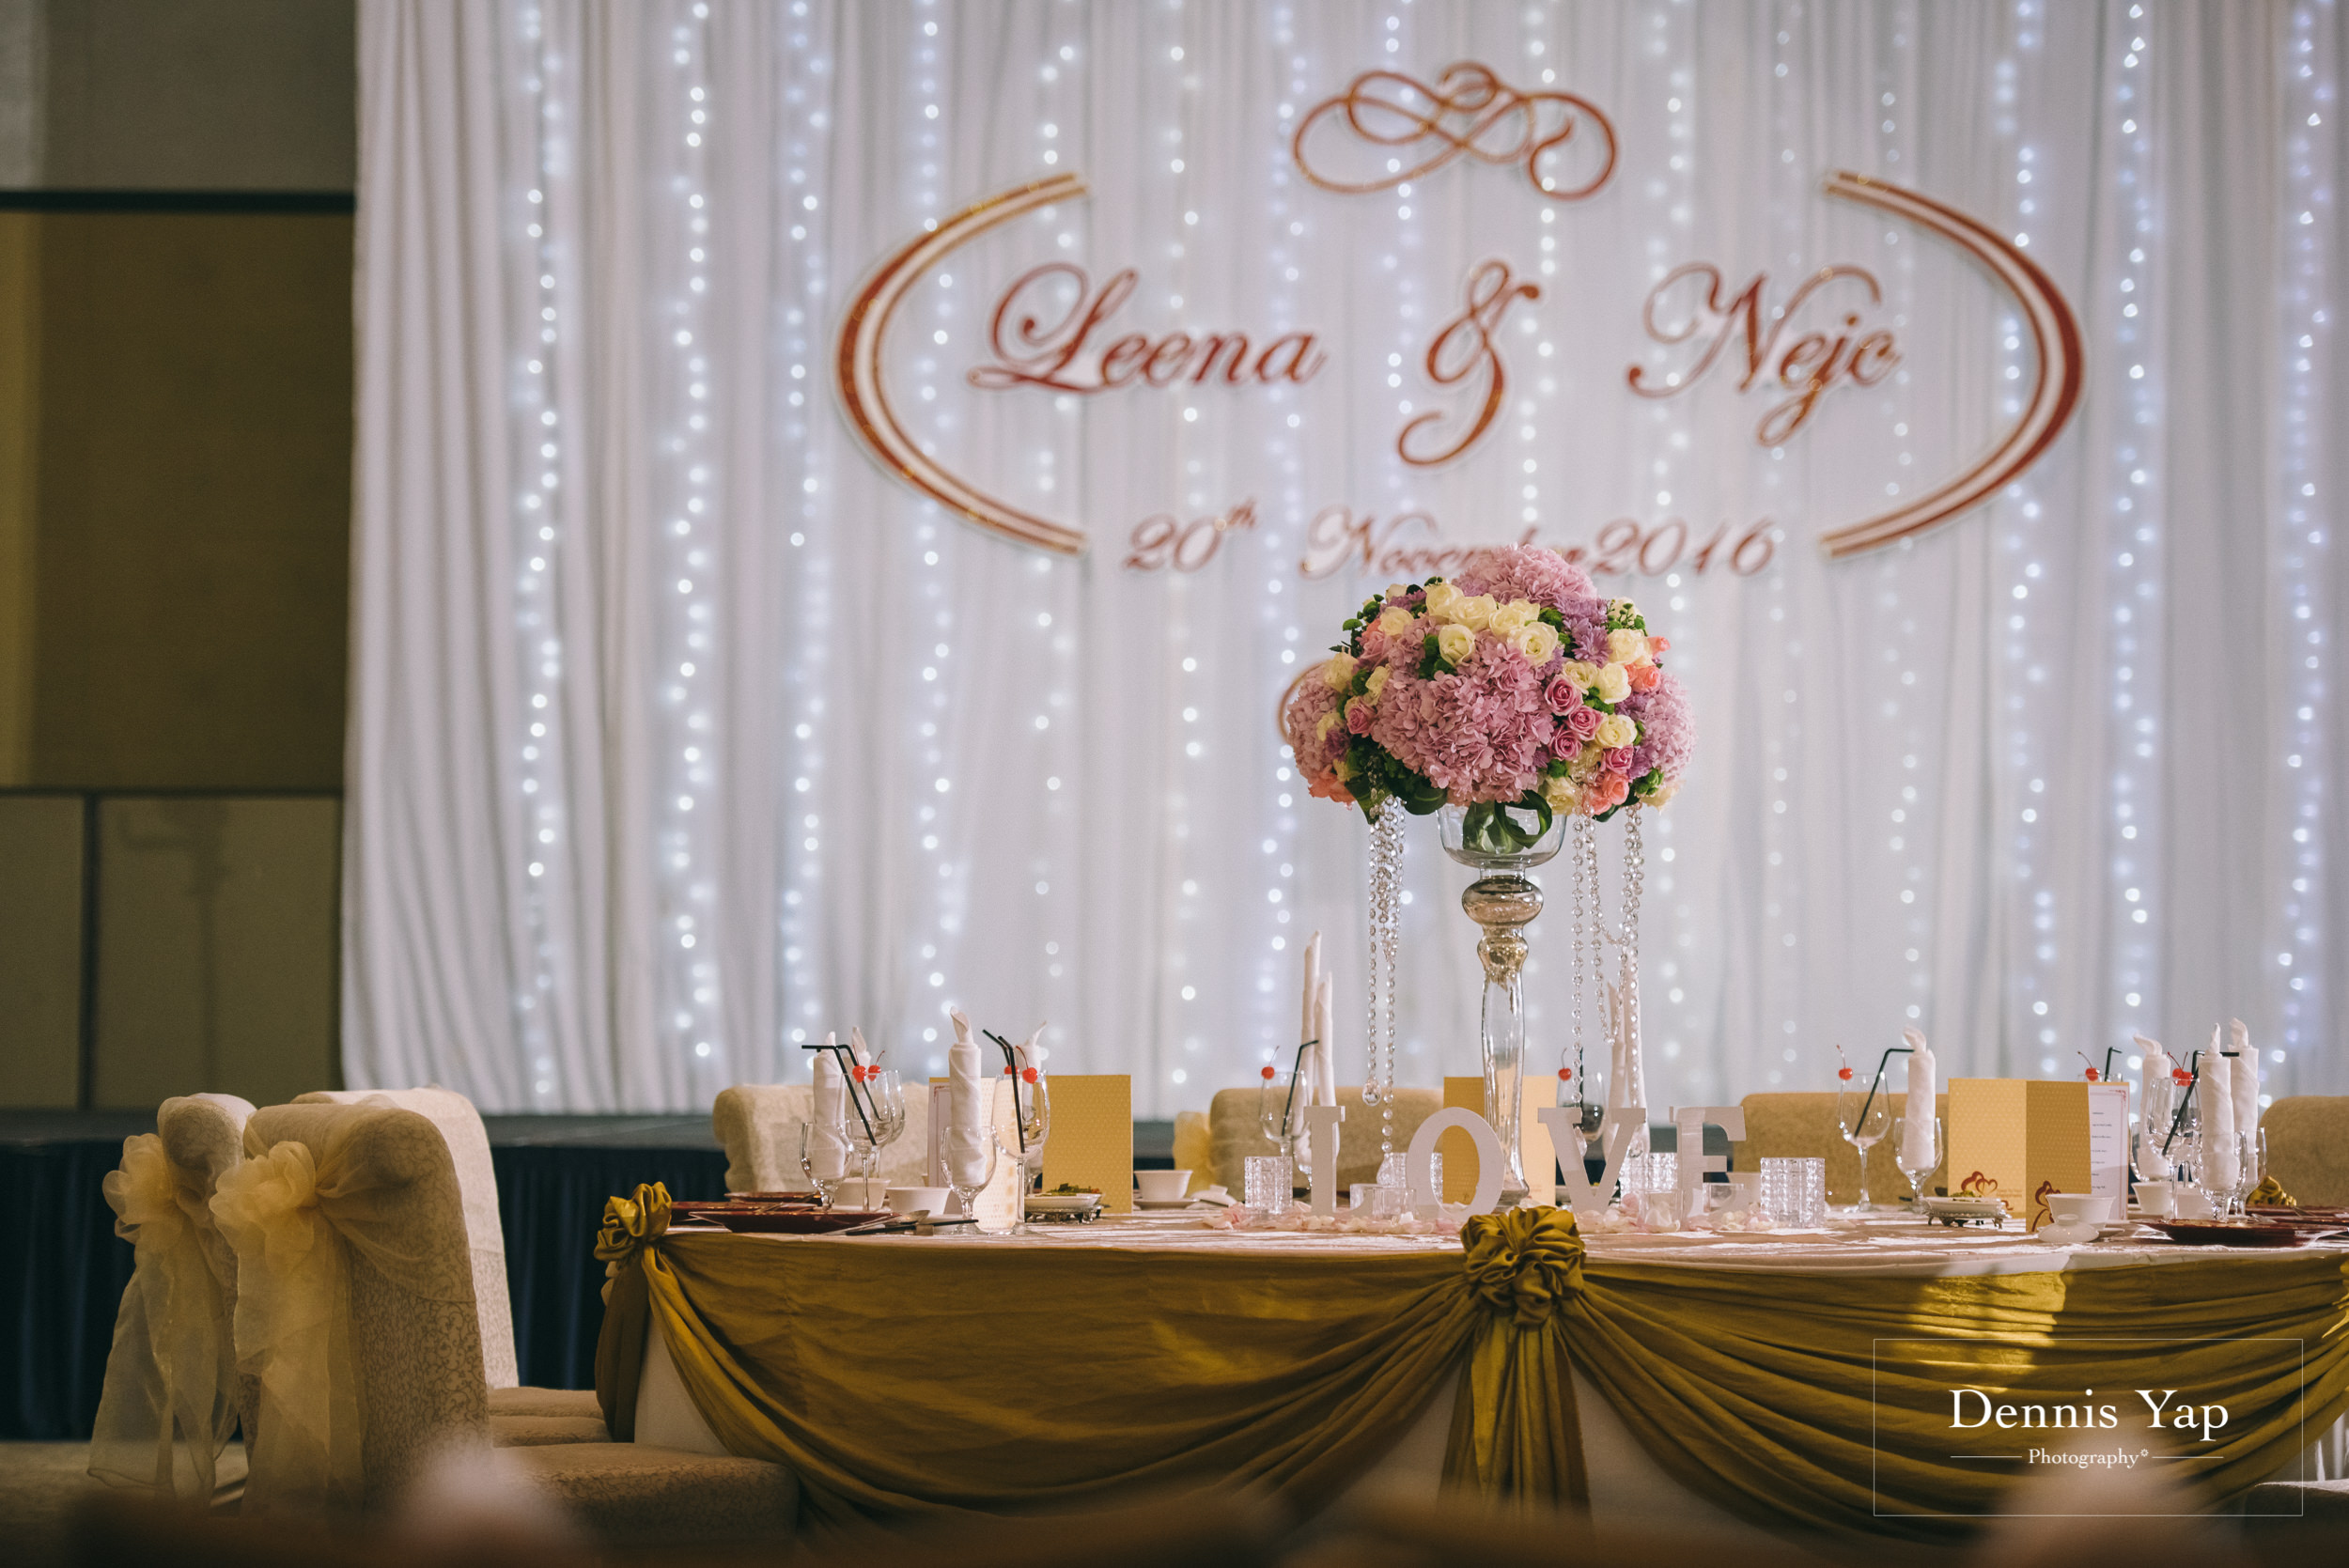 nejd leena slovenian wedding reception malaysia wedding photographer dennis yap premier hotel klang-1.jpg